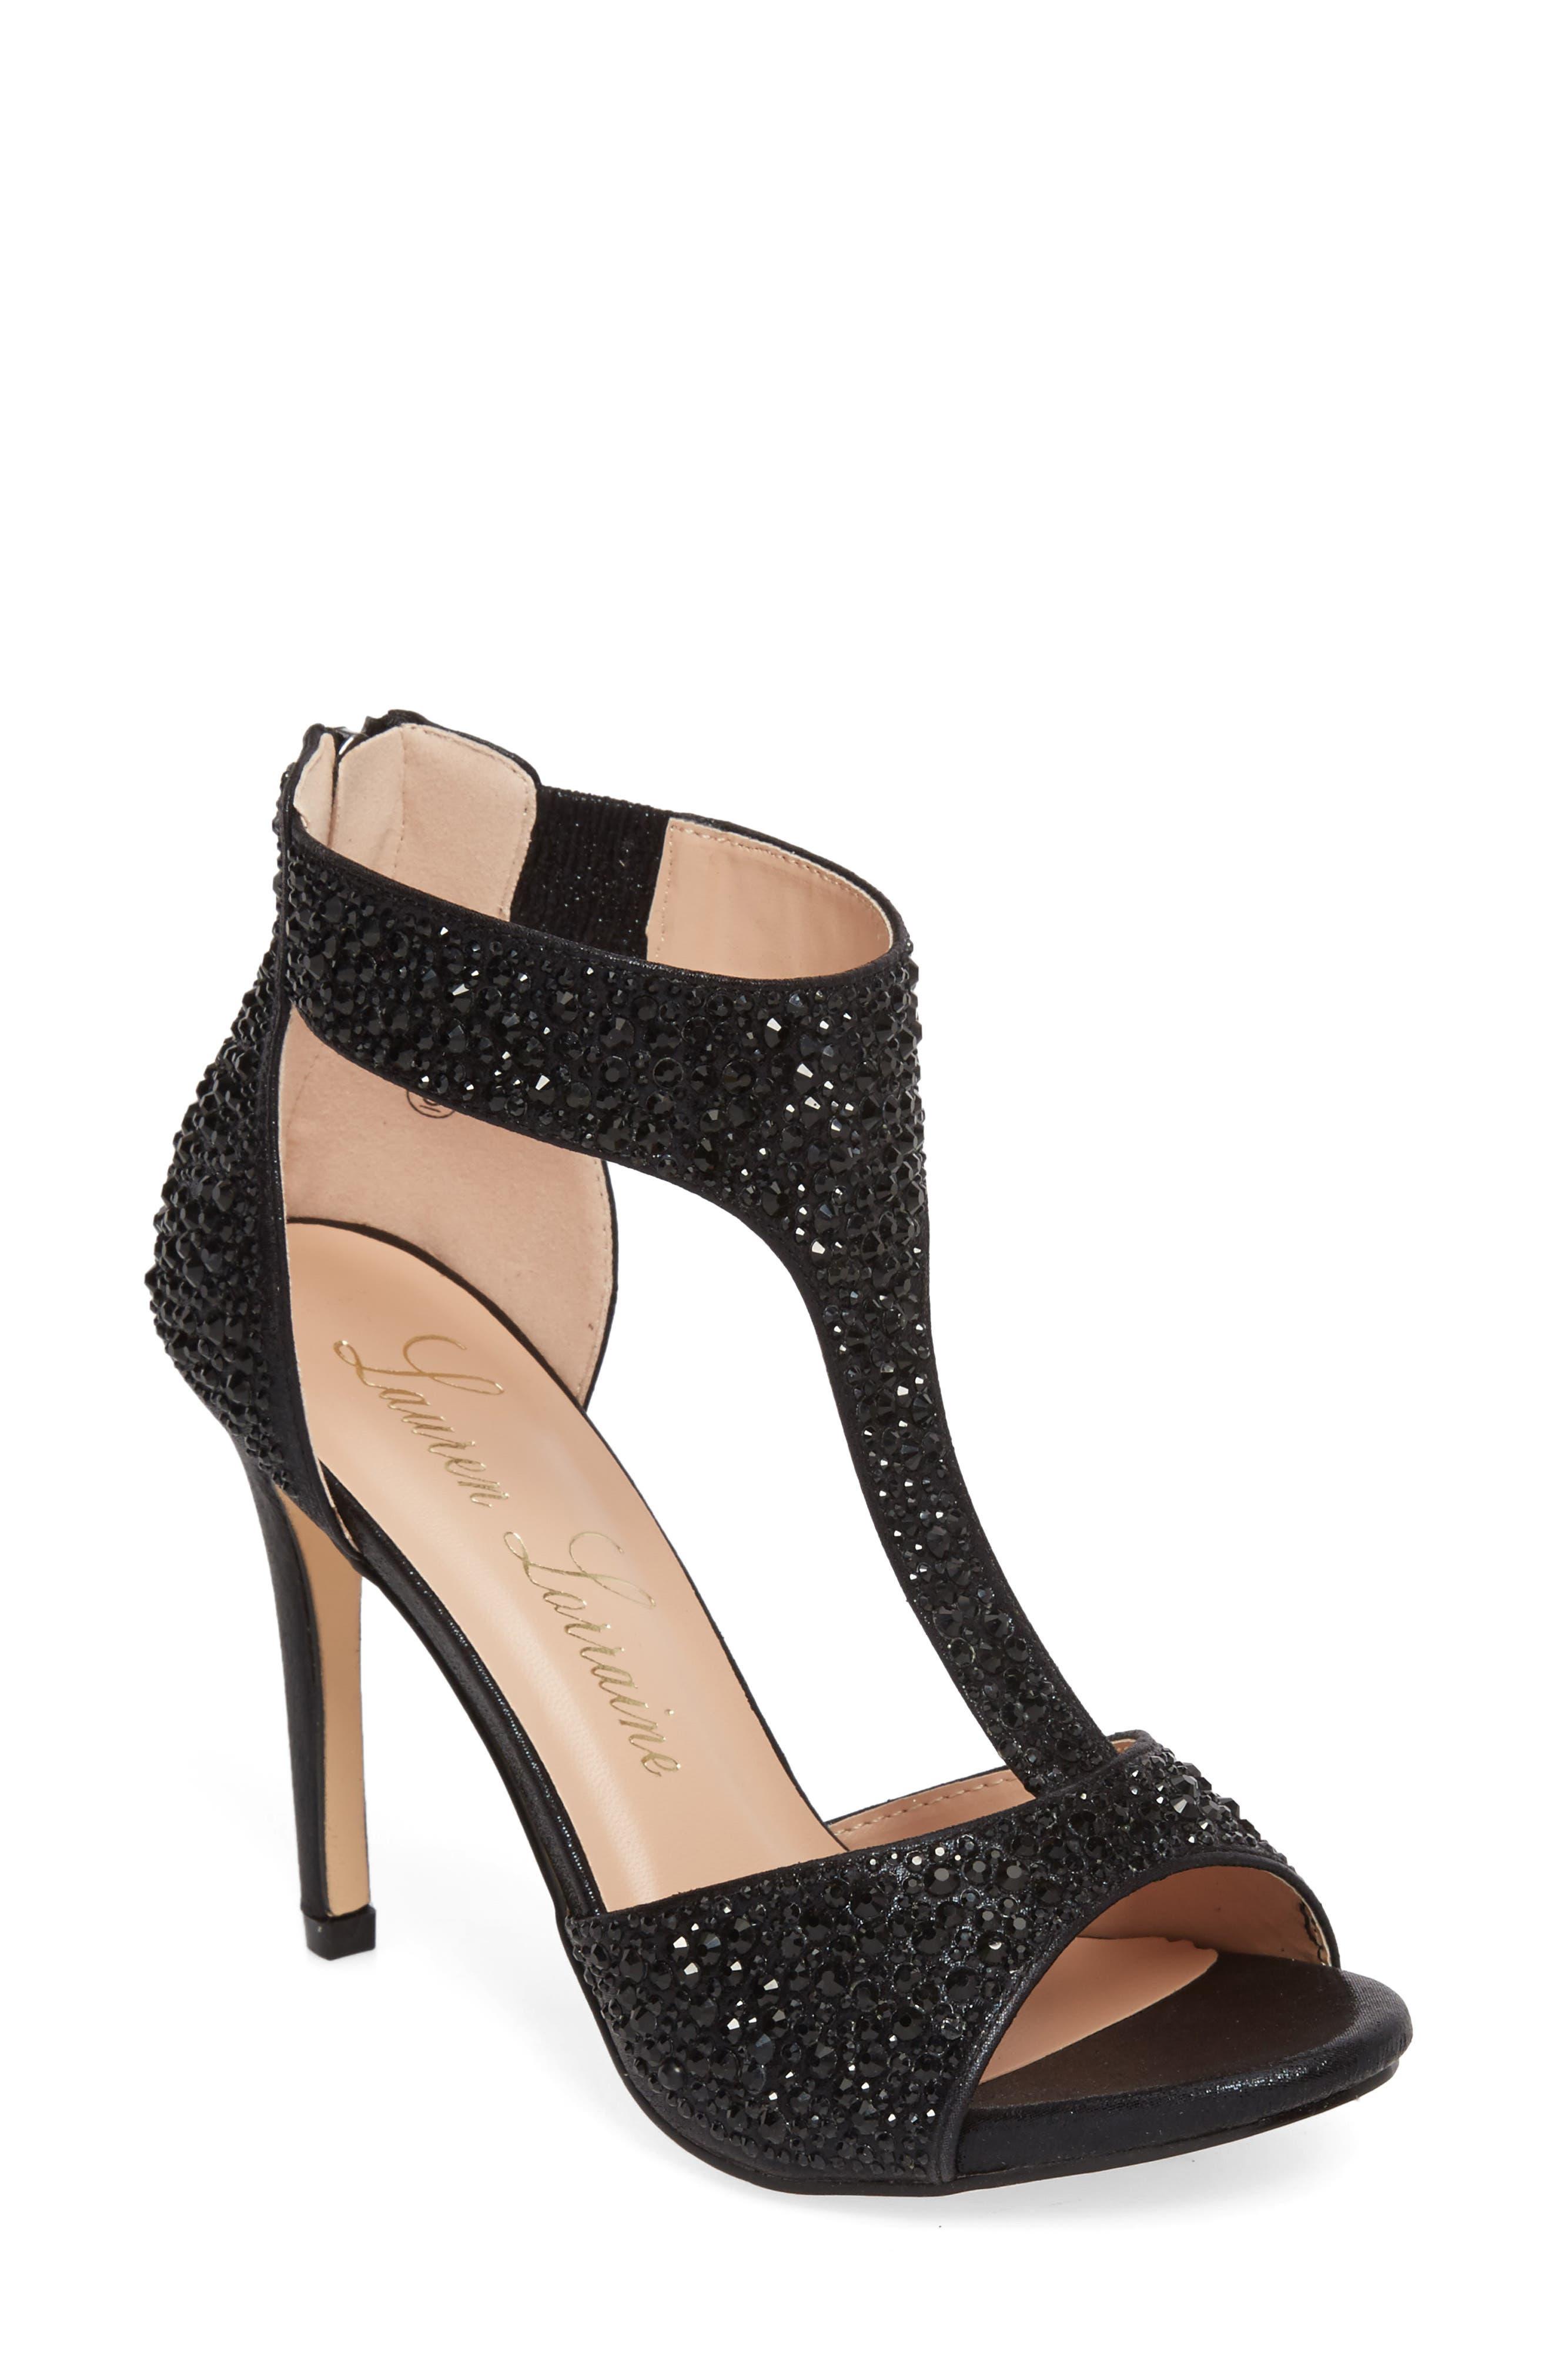 Ina Crystal Embellished Sandal,                             Main thumbnail 1, color,                             BLACK